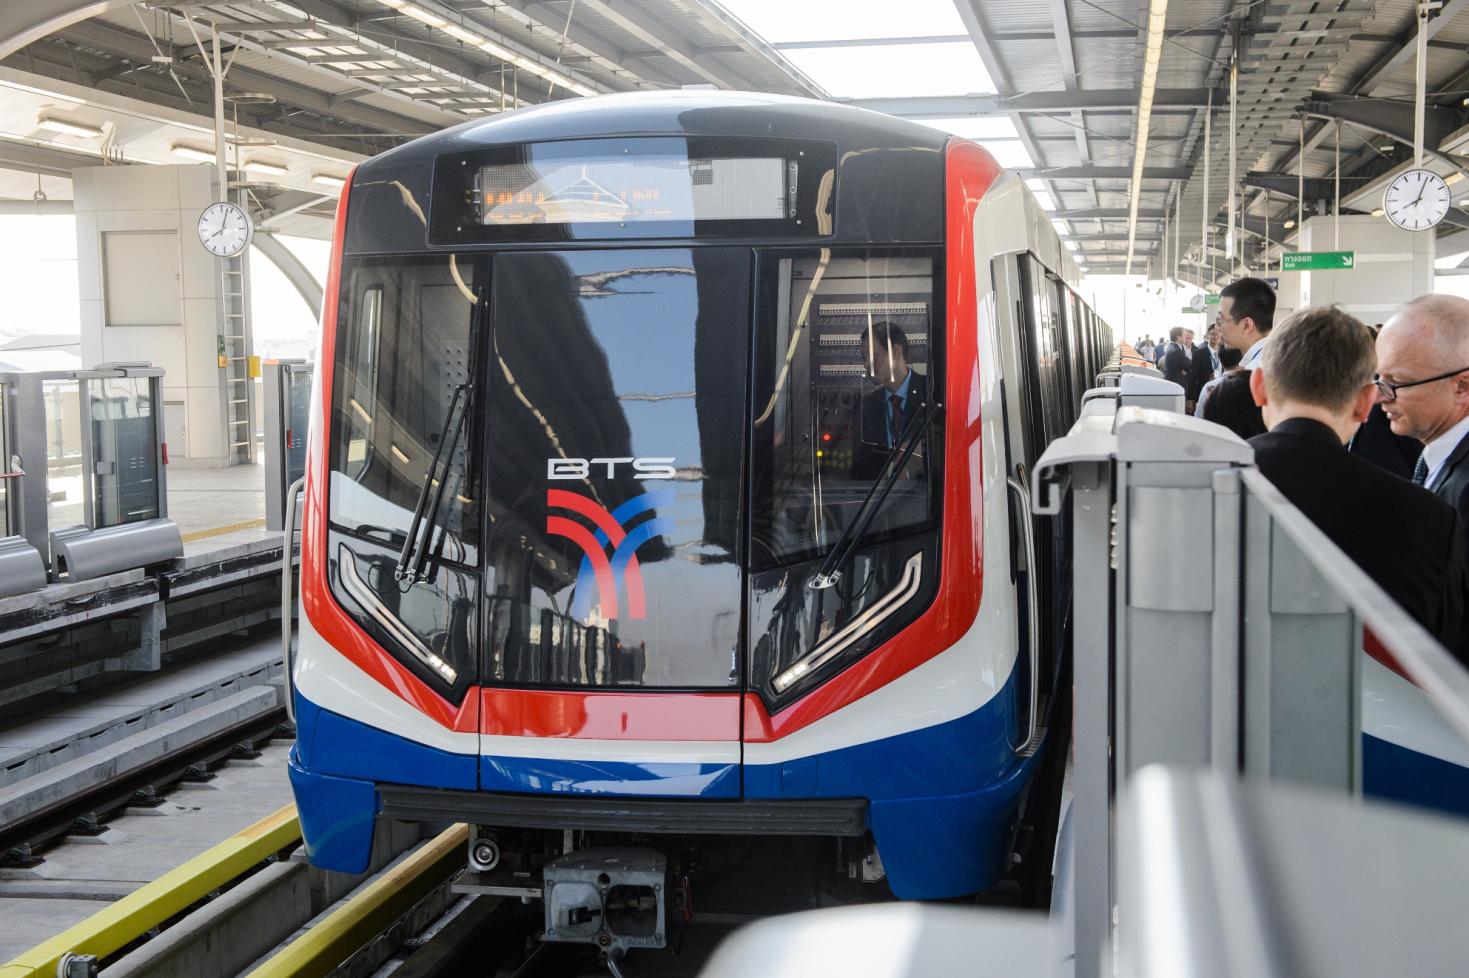 New Siemens metros for the Bangkok Skytrain